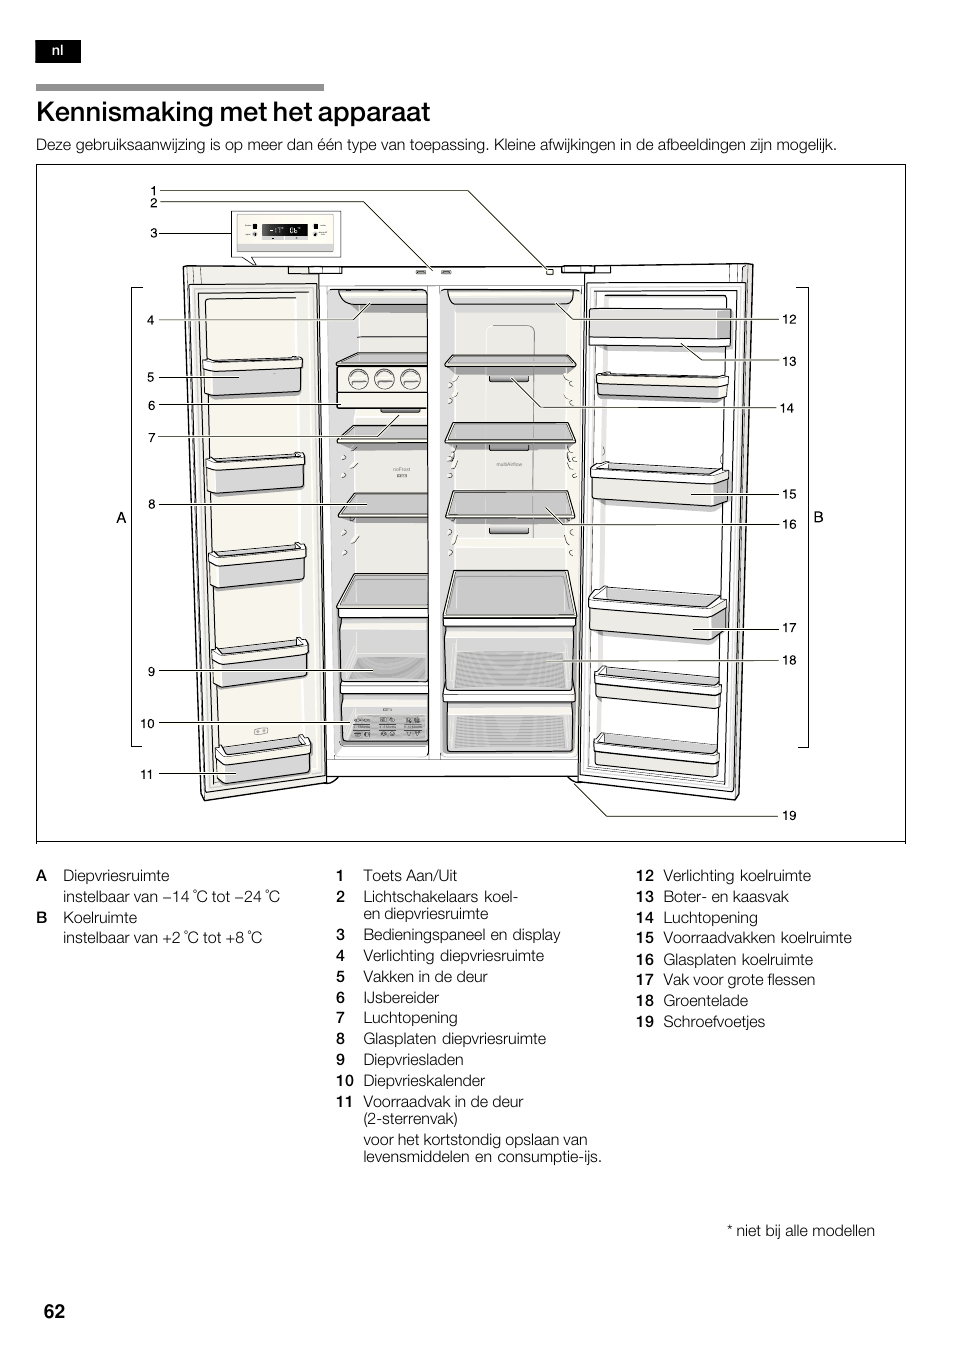 Kennismaking met het apparaat | Bosch KAN62V40 Frigo-congelatore Side by  Side Inox look User